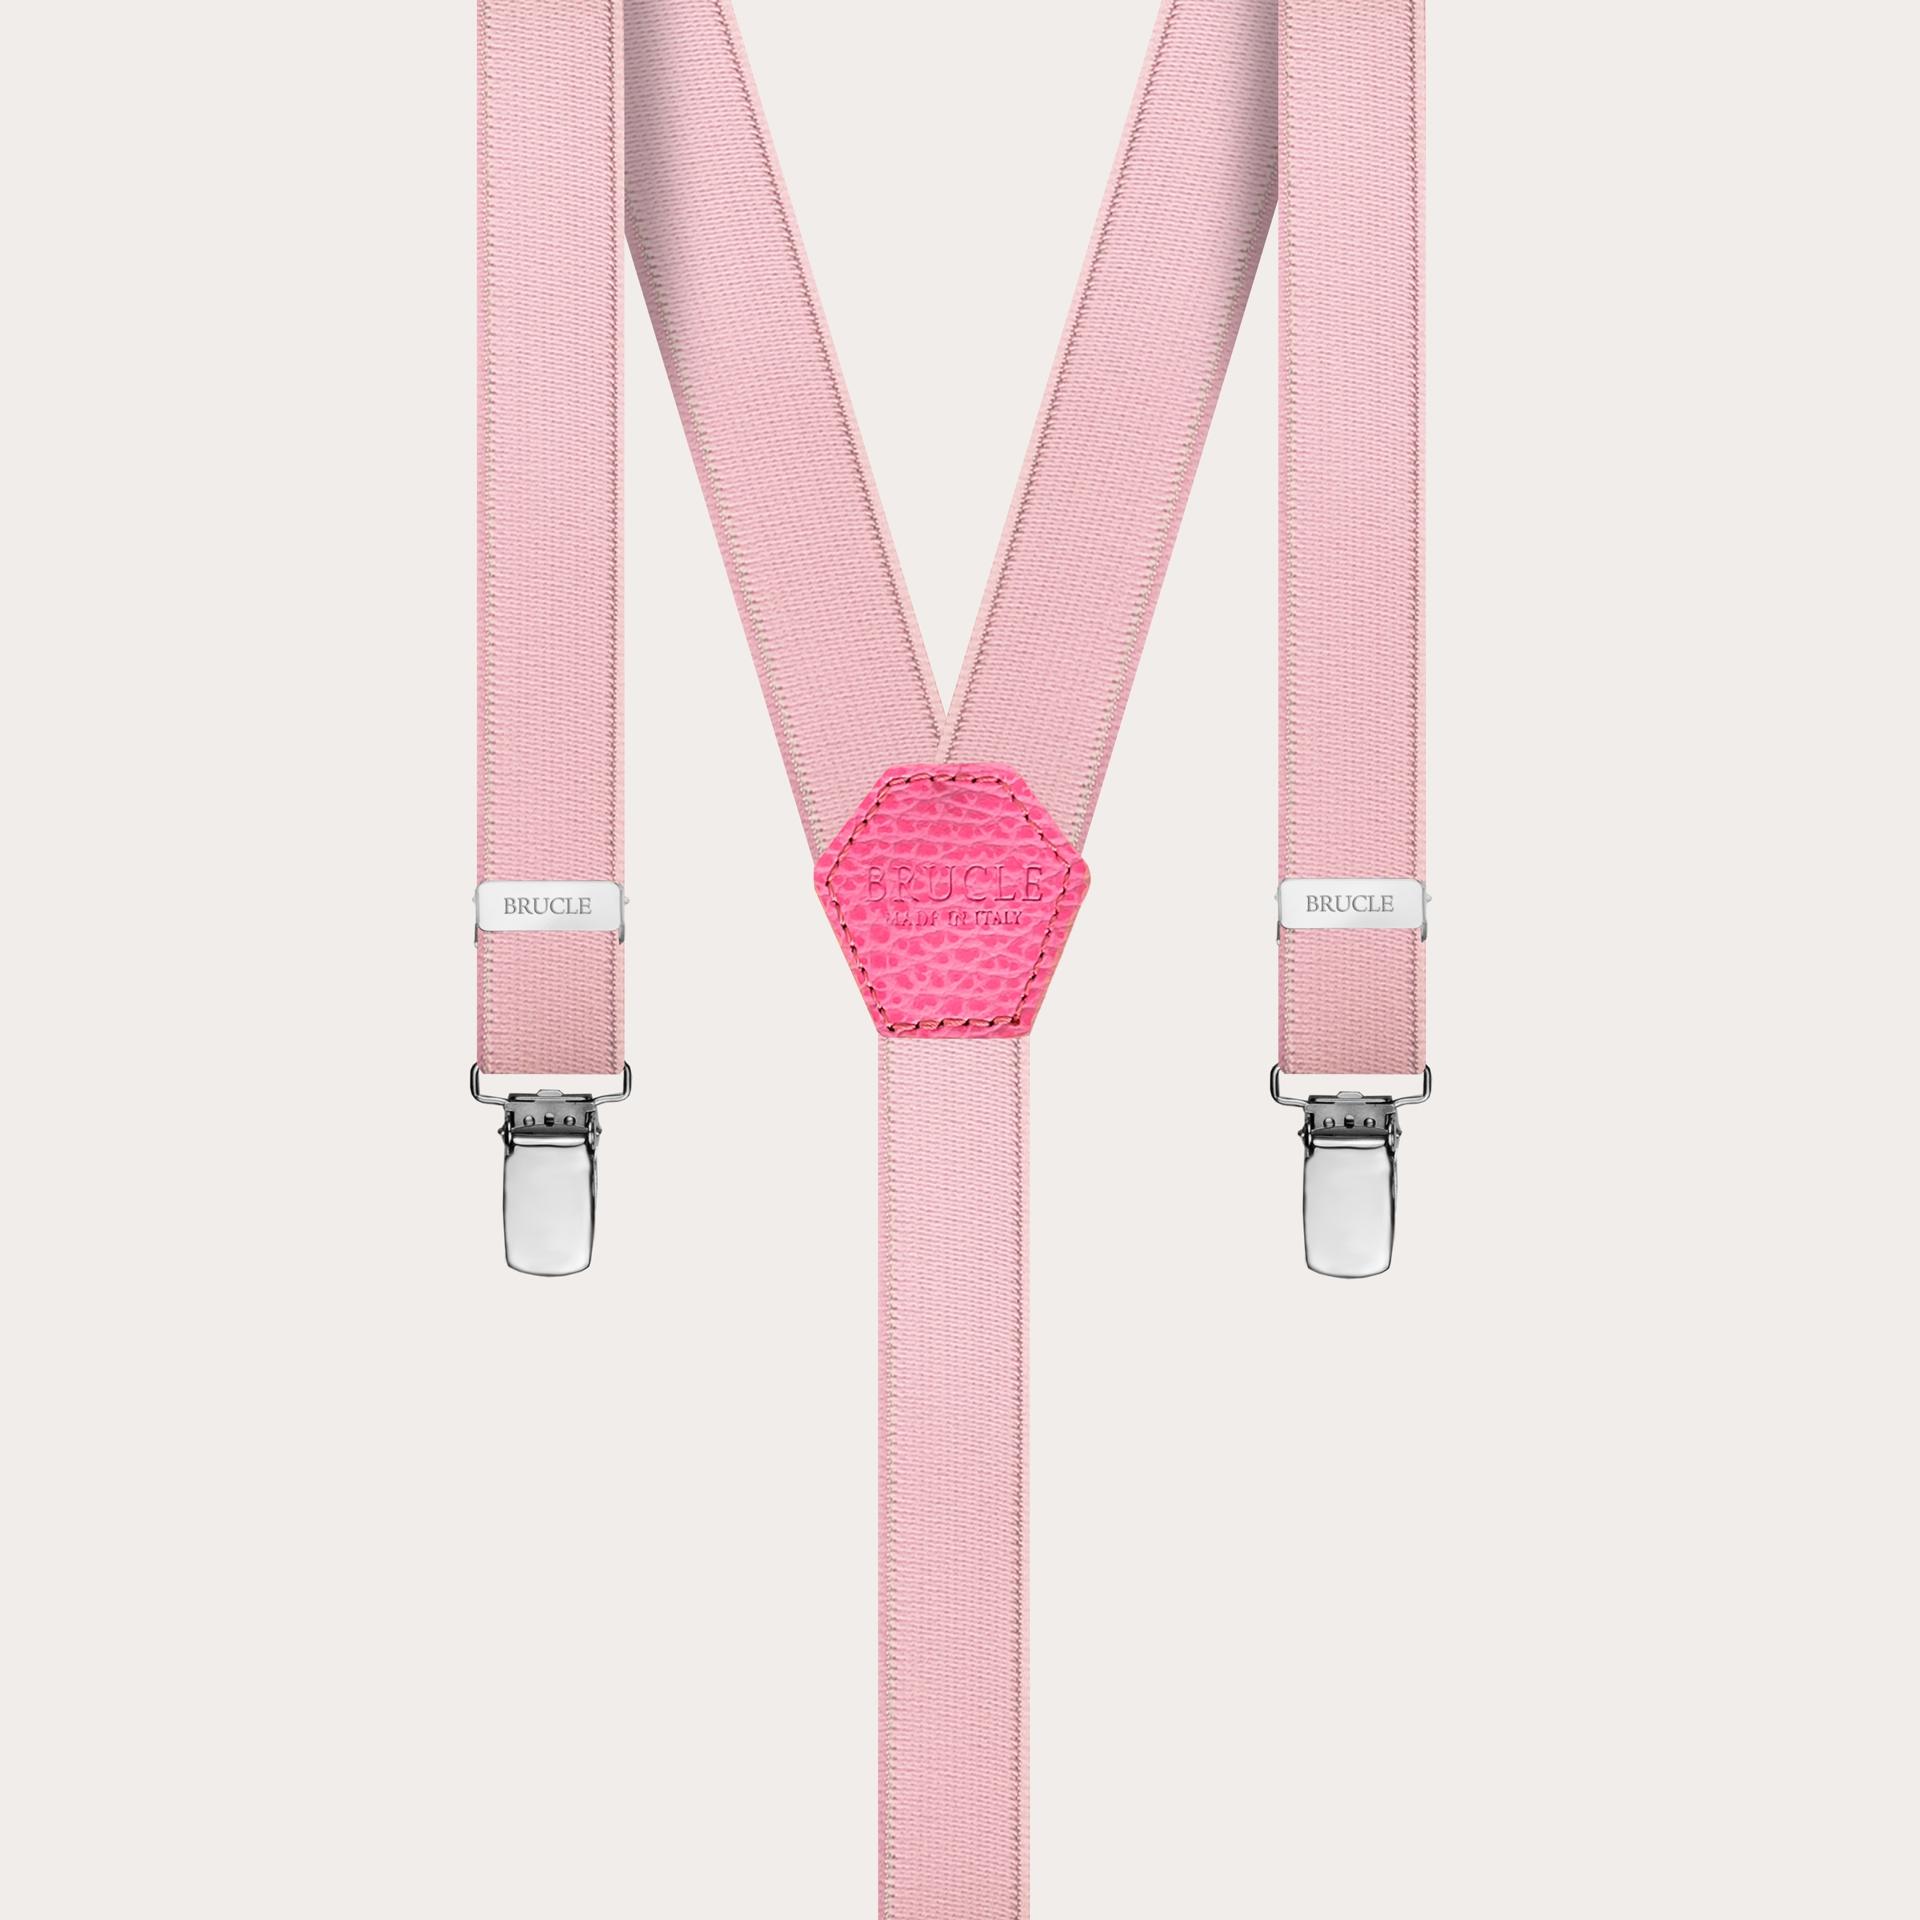 Brucle Bretelle cerimonia raso rosa